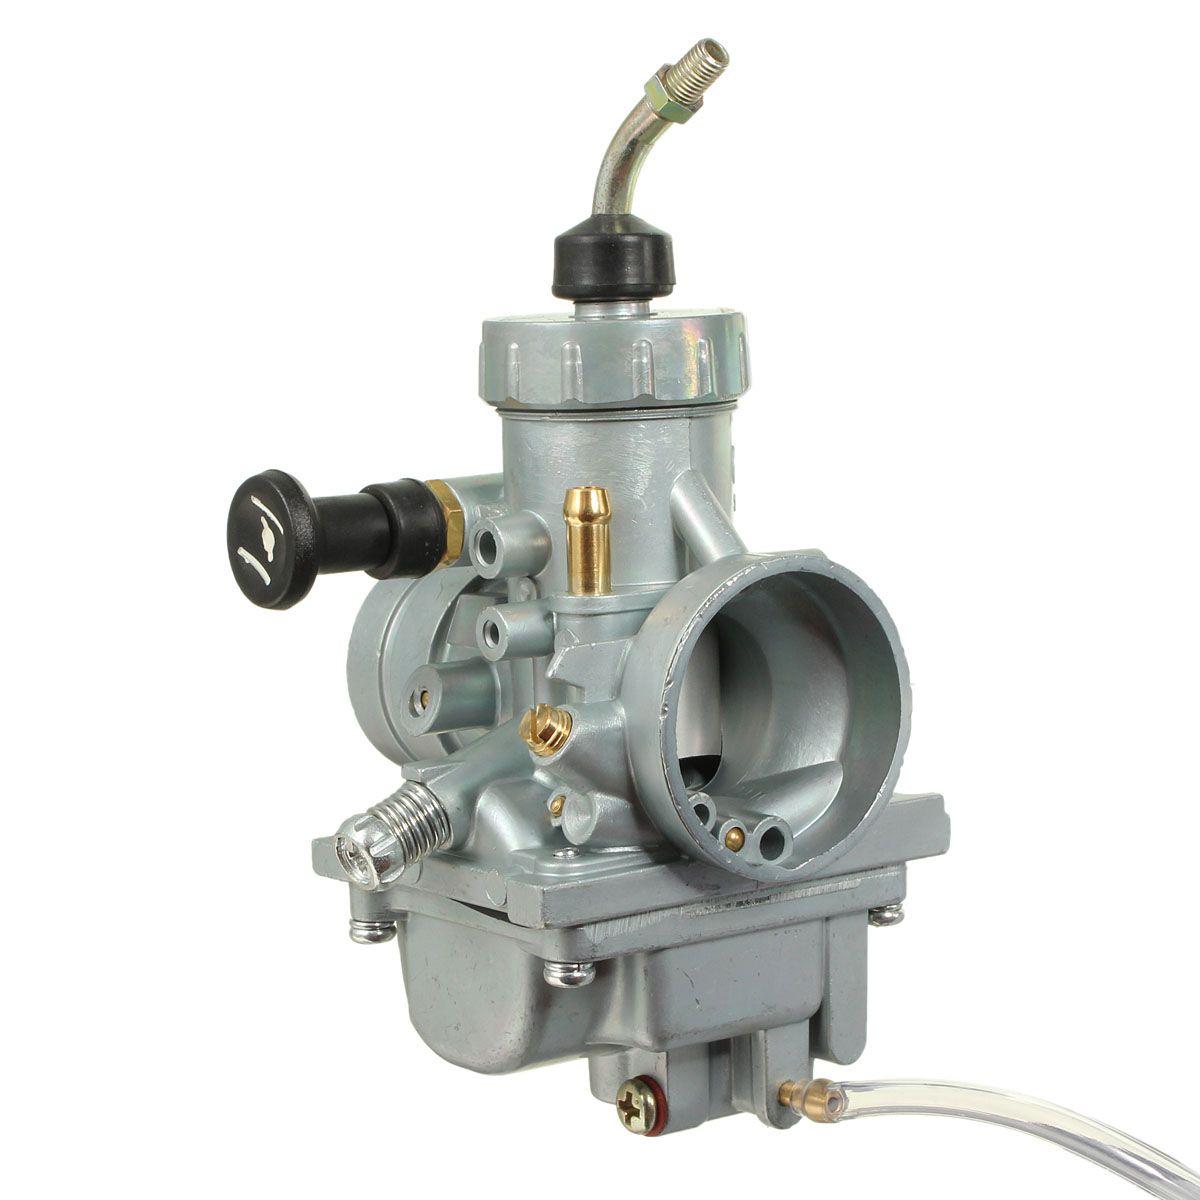 New 28mm 40mm Carburetor Carb For Suzuki RM80 RM85 VM24 SUV Engine Metal